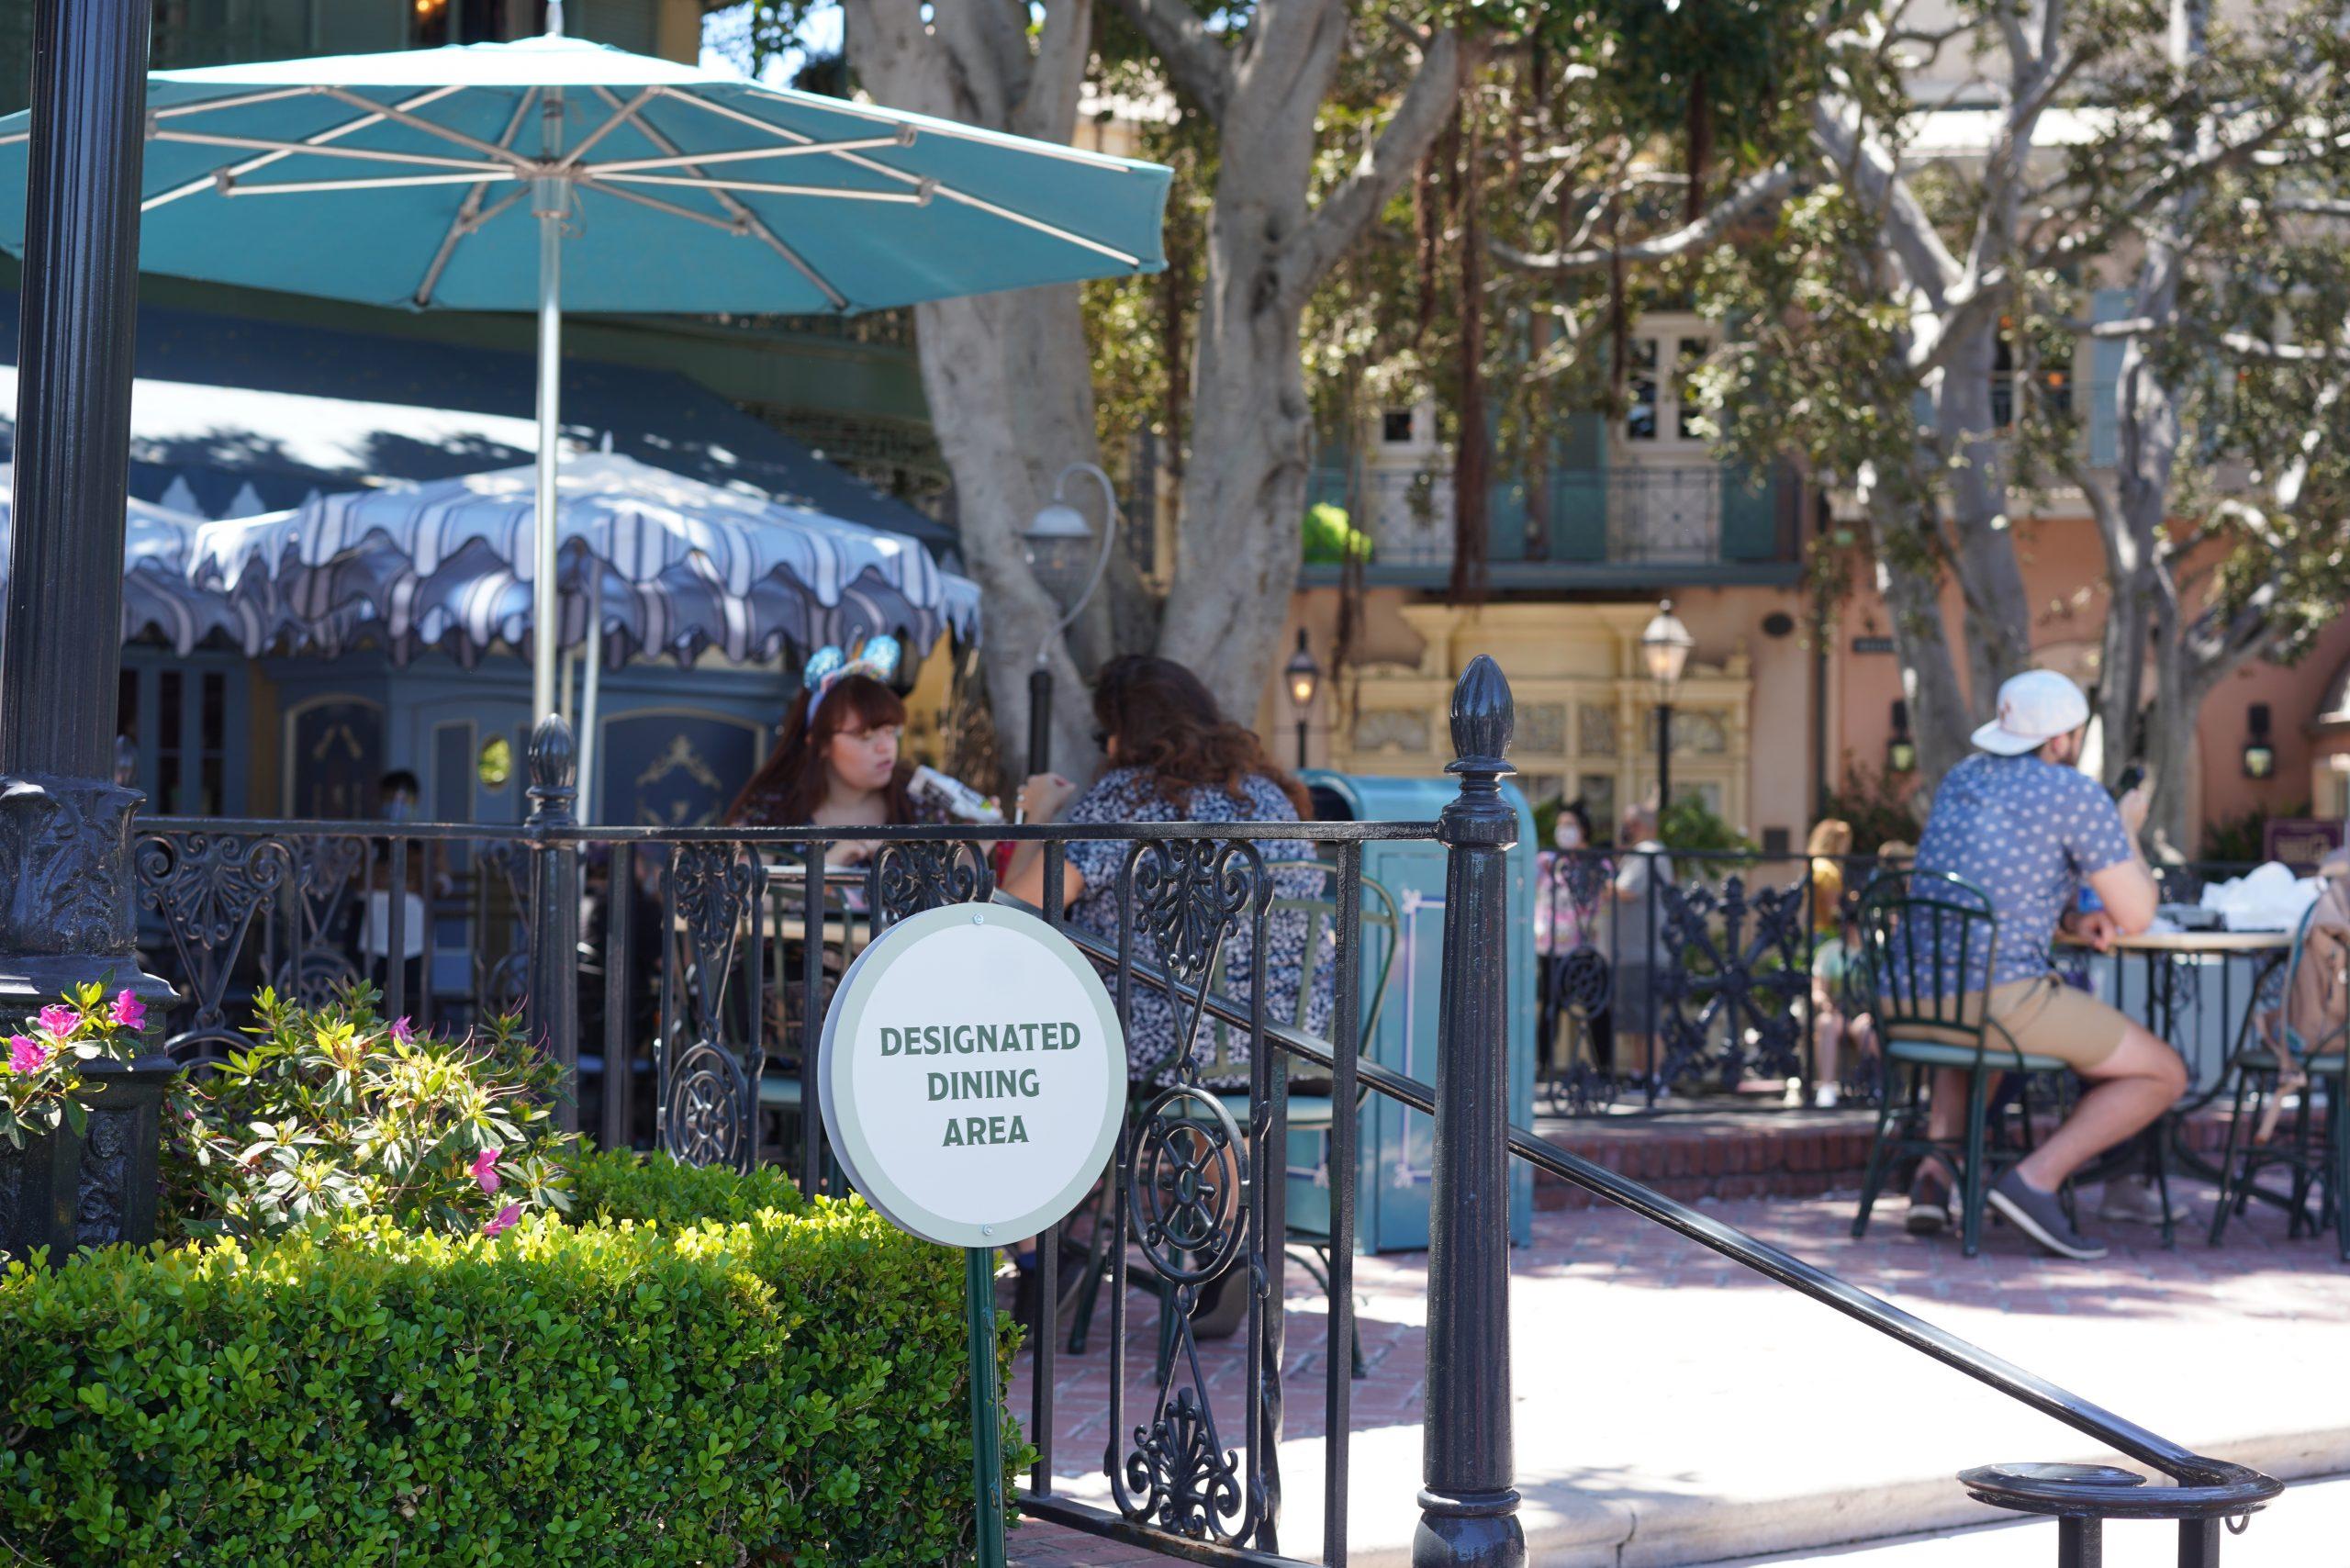 Designated dining area inside Disneyland